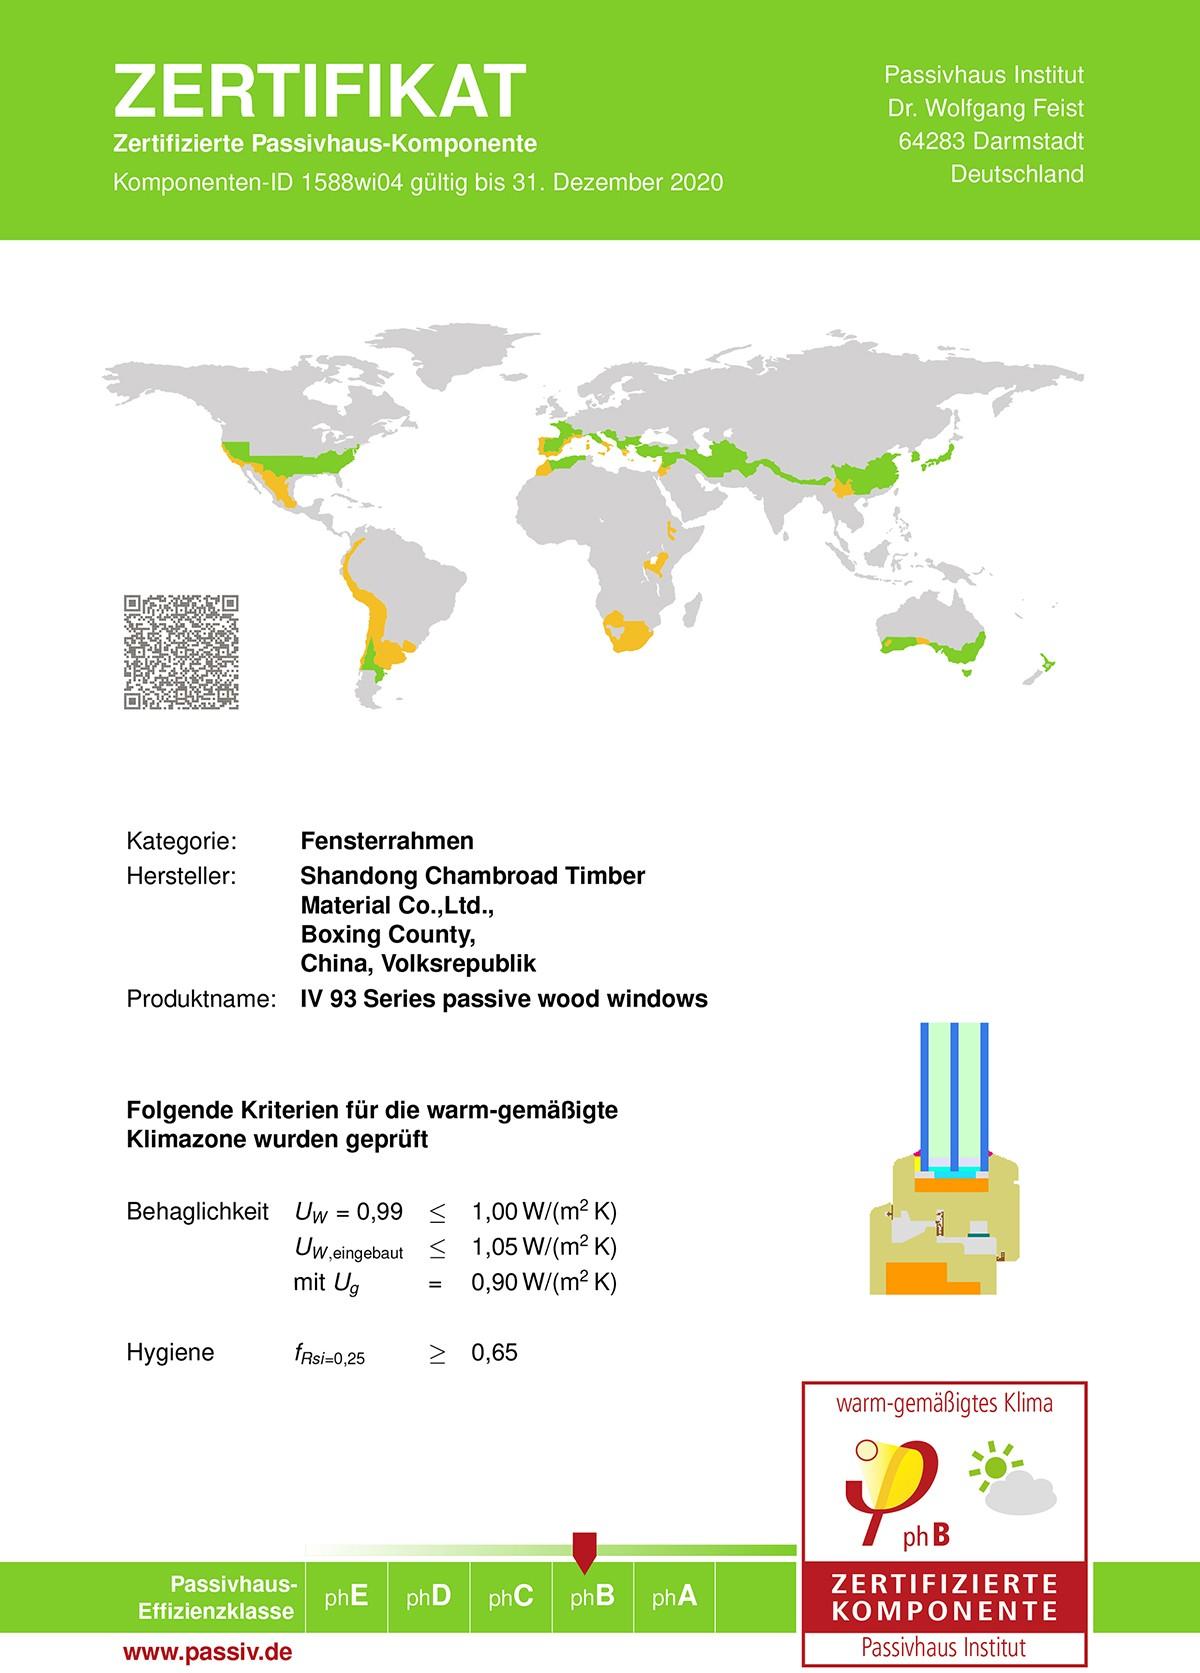 PHI产品认证德文证书-1.jpg